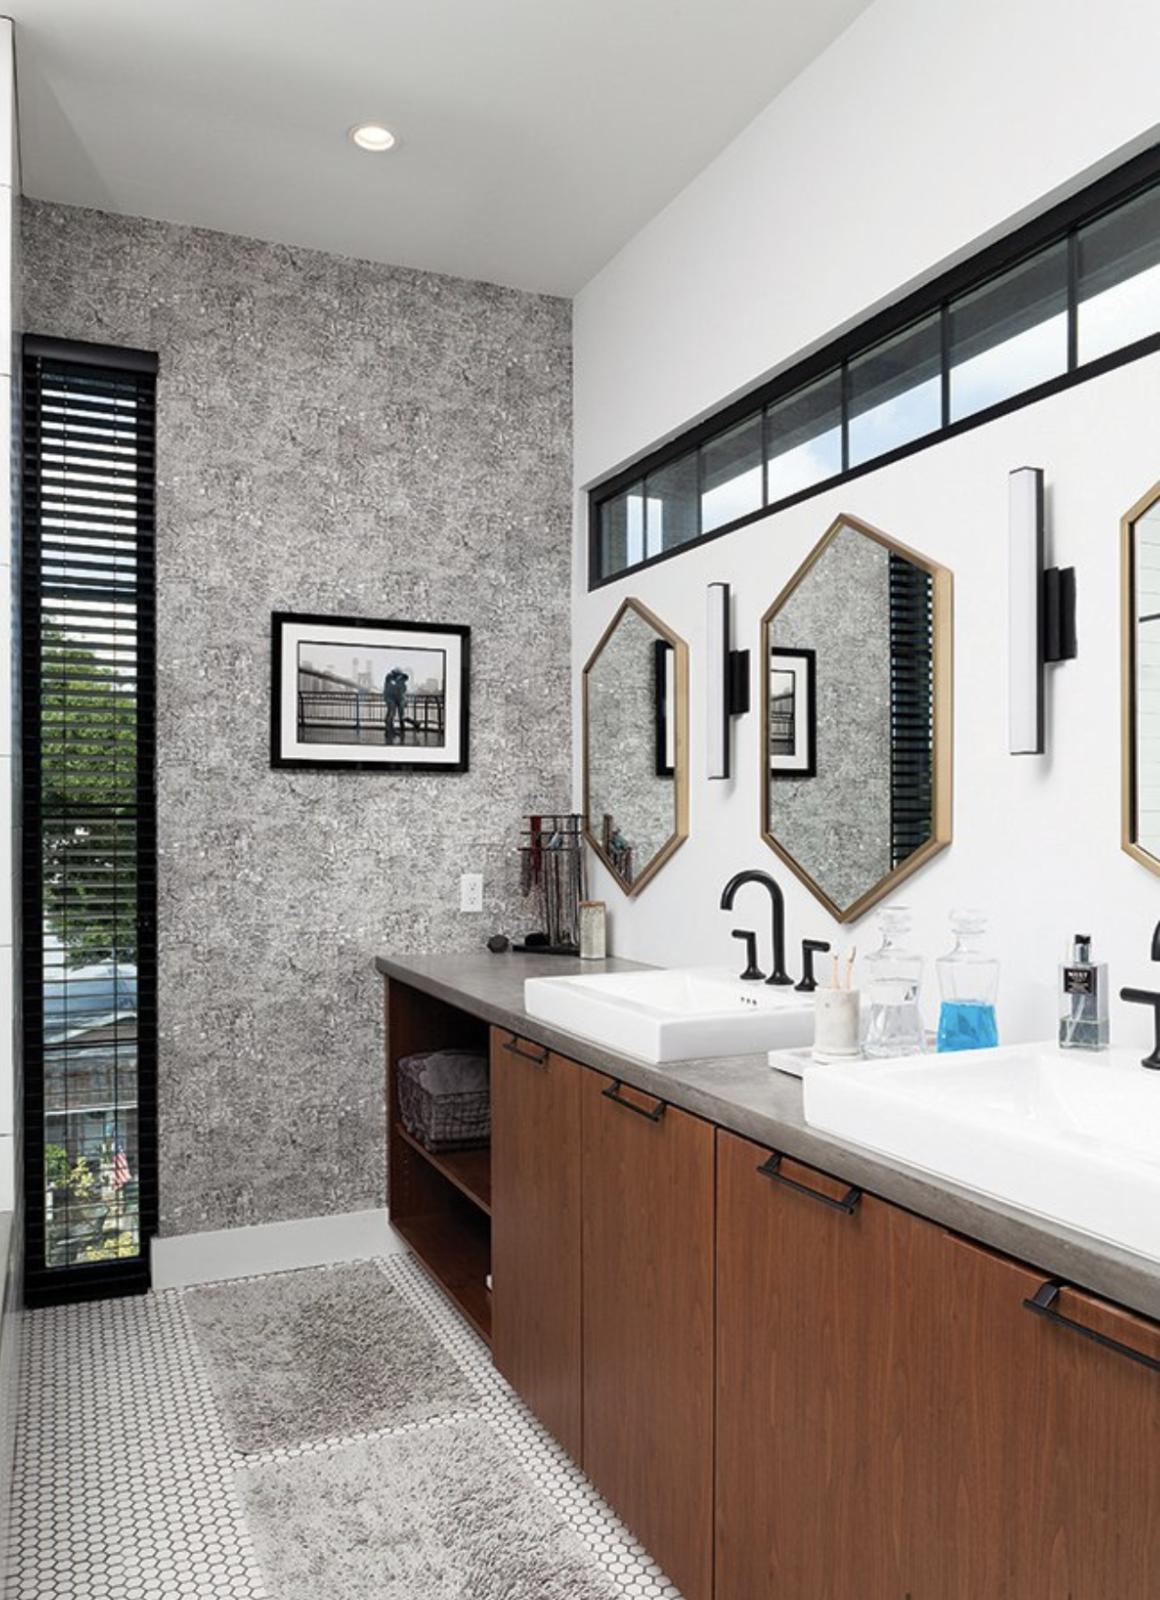 Bath Room, Ceiling Lighting, Marble Floor, Wall Lighting, Full Shower, Subway Tile Wall, Enclosed Shower, Vessel Sink, Concrete Counter, Corner Shower, and Ceramic Tile Wall Master Bath Detail 01  400 SOLA